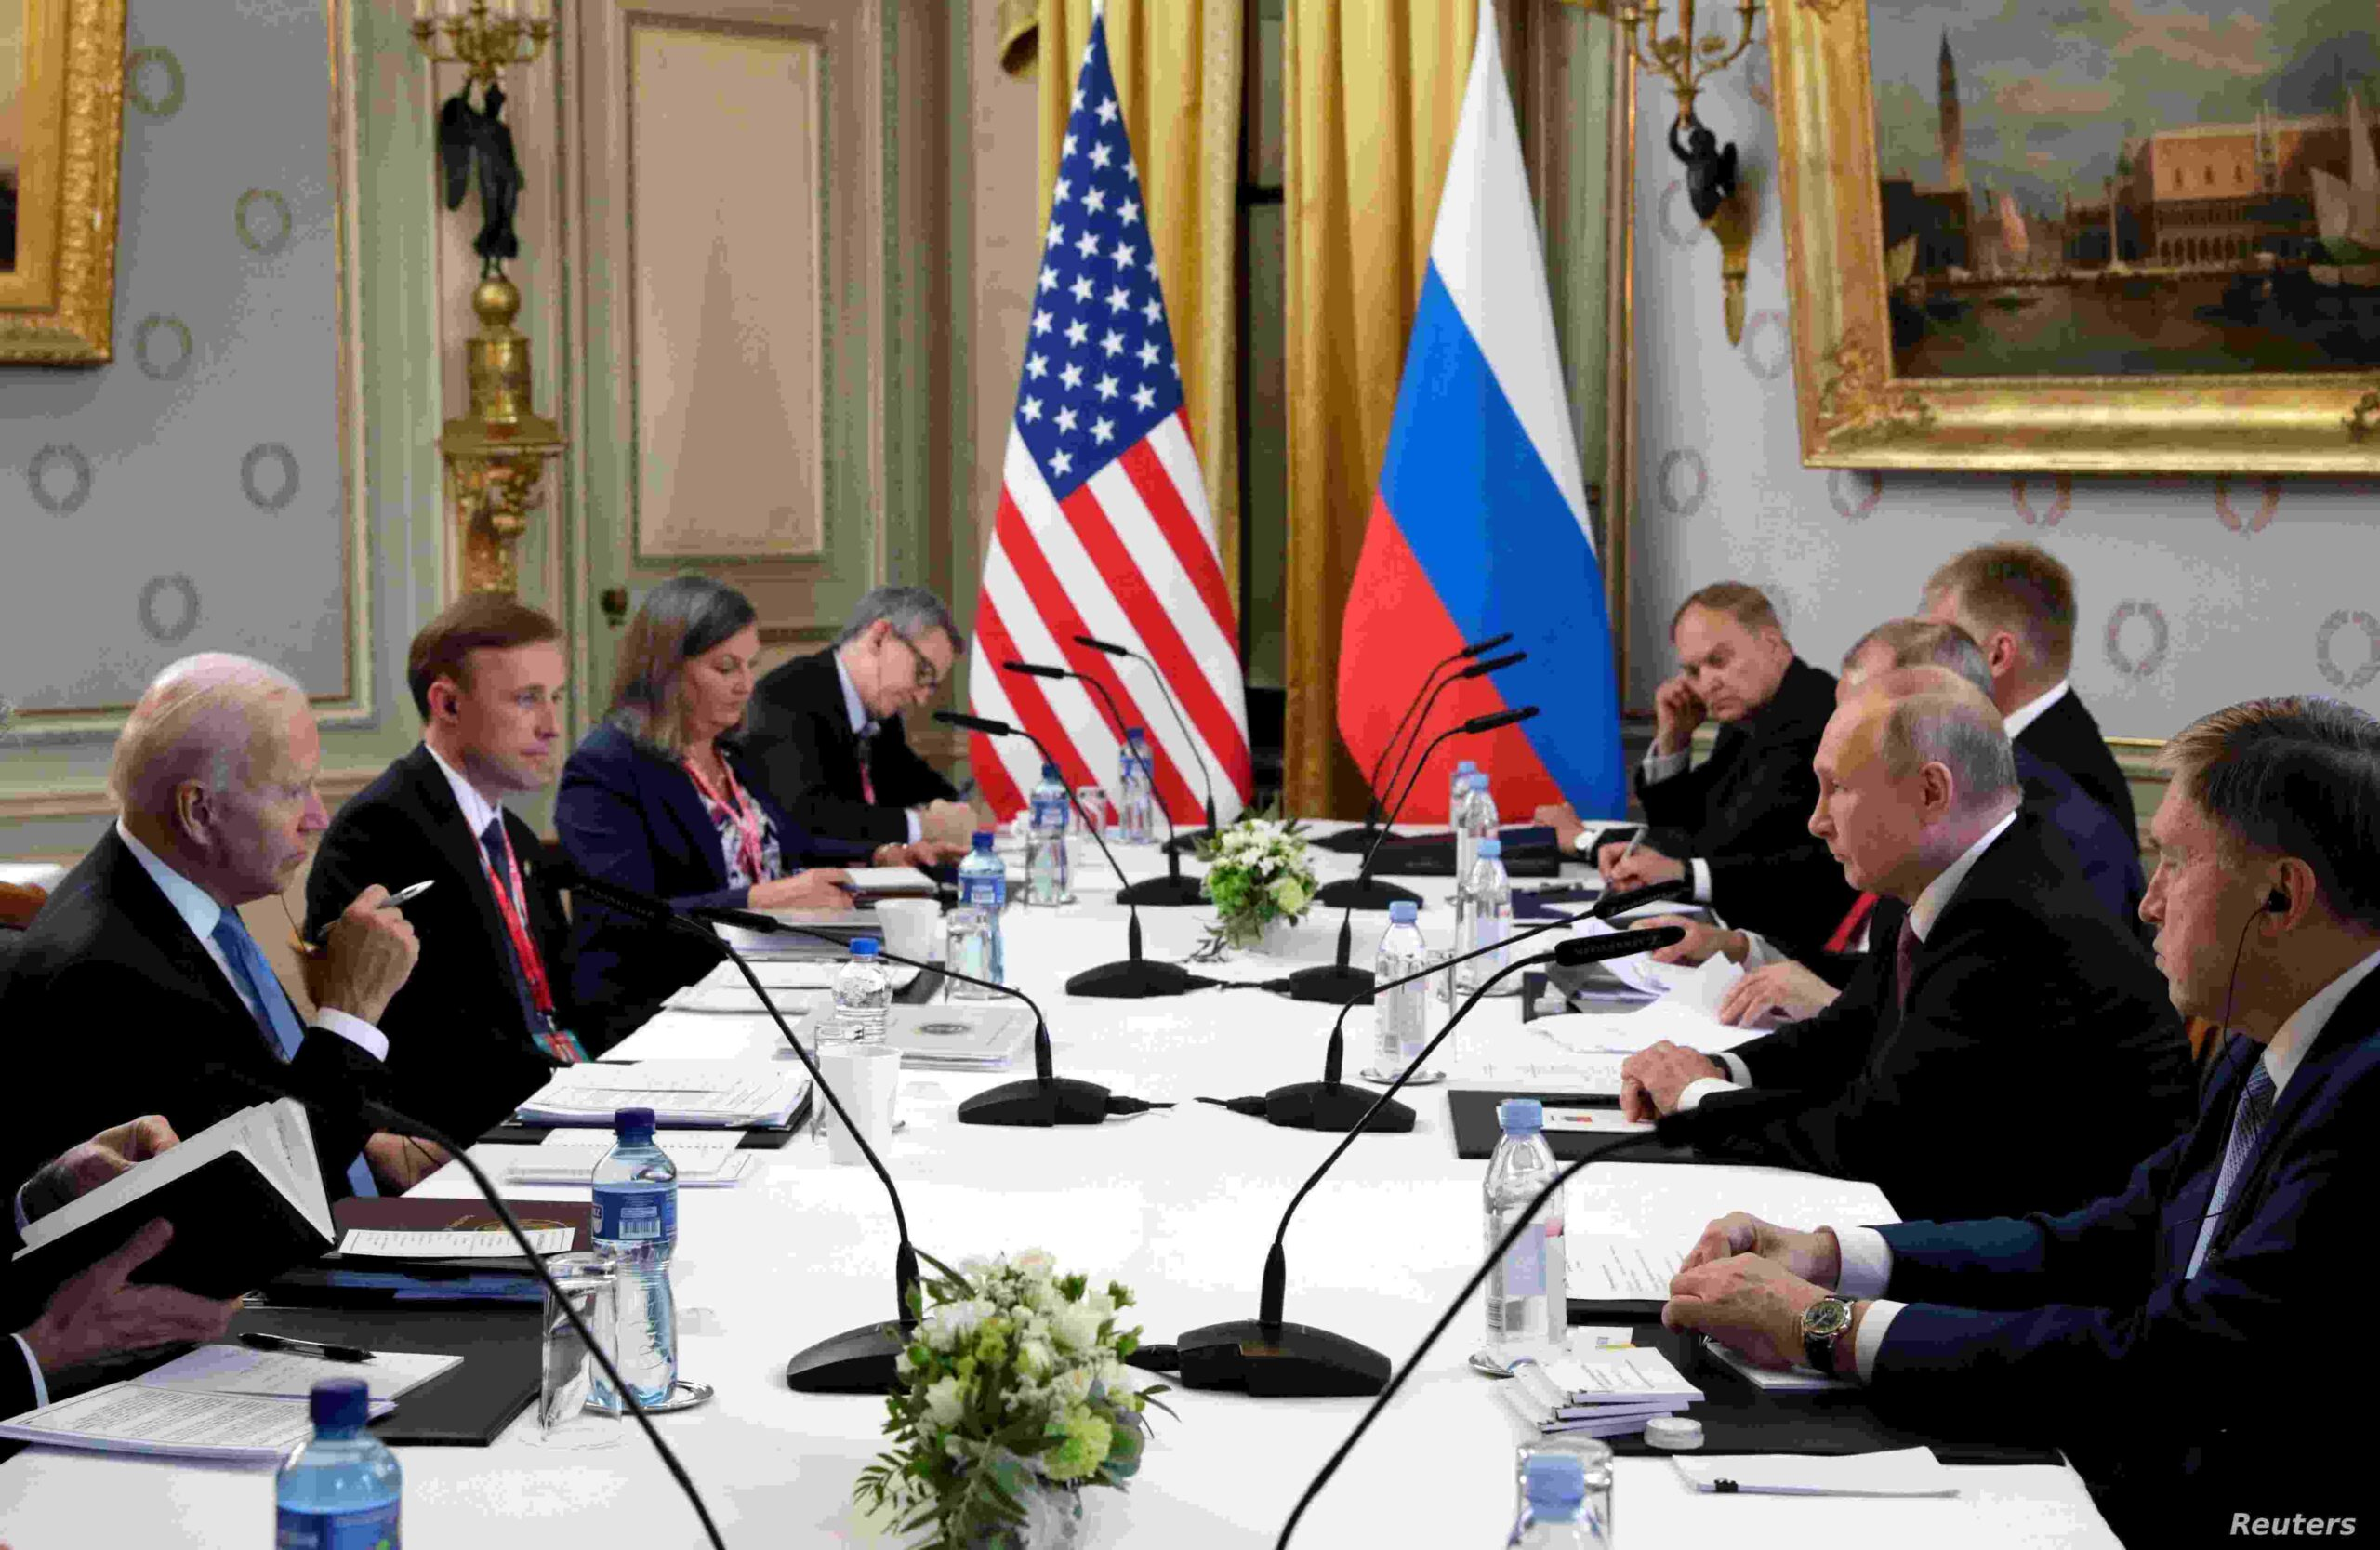 U.S. President Joe Biden and Russia's President Vladimir Putin